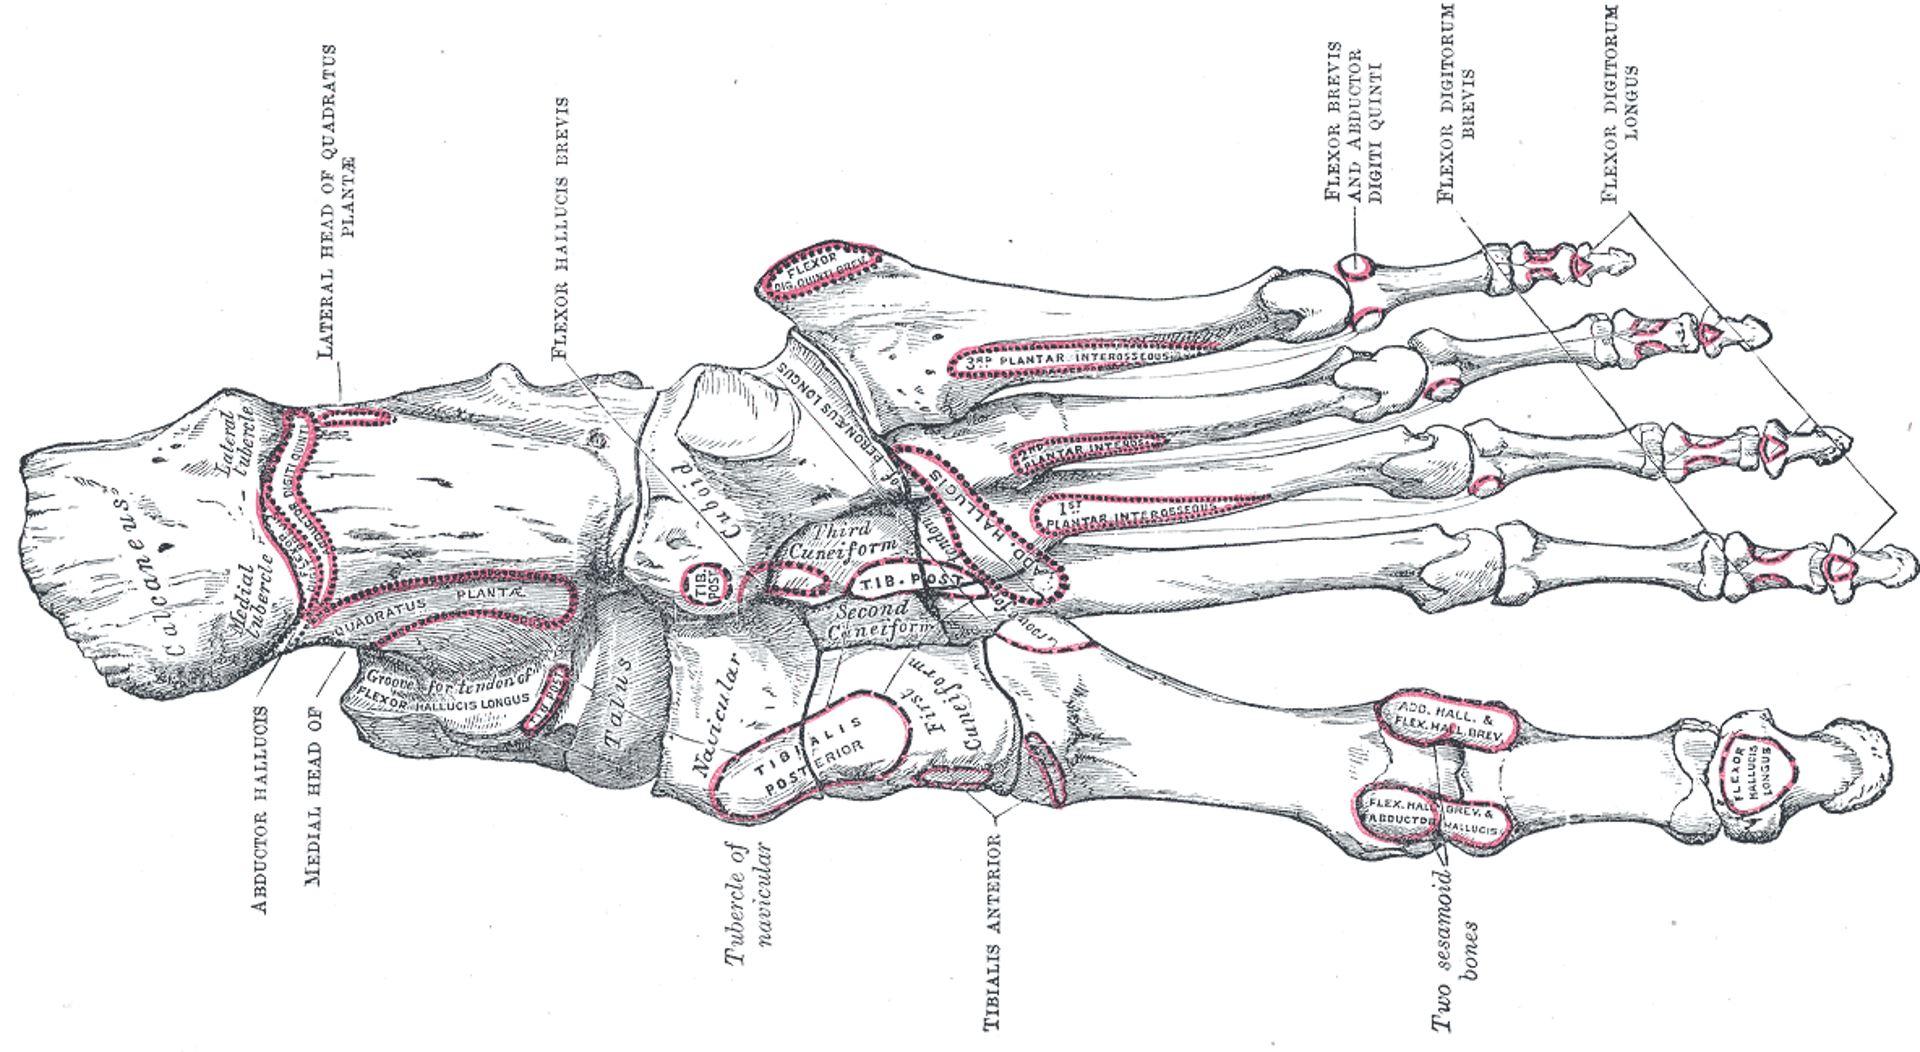 Grays Anatomy Fig 269 - Foot